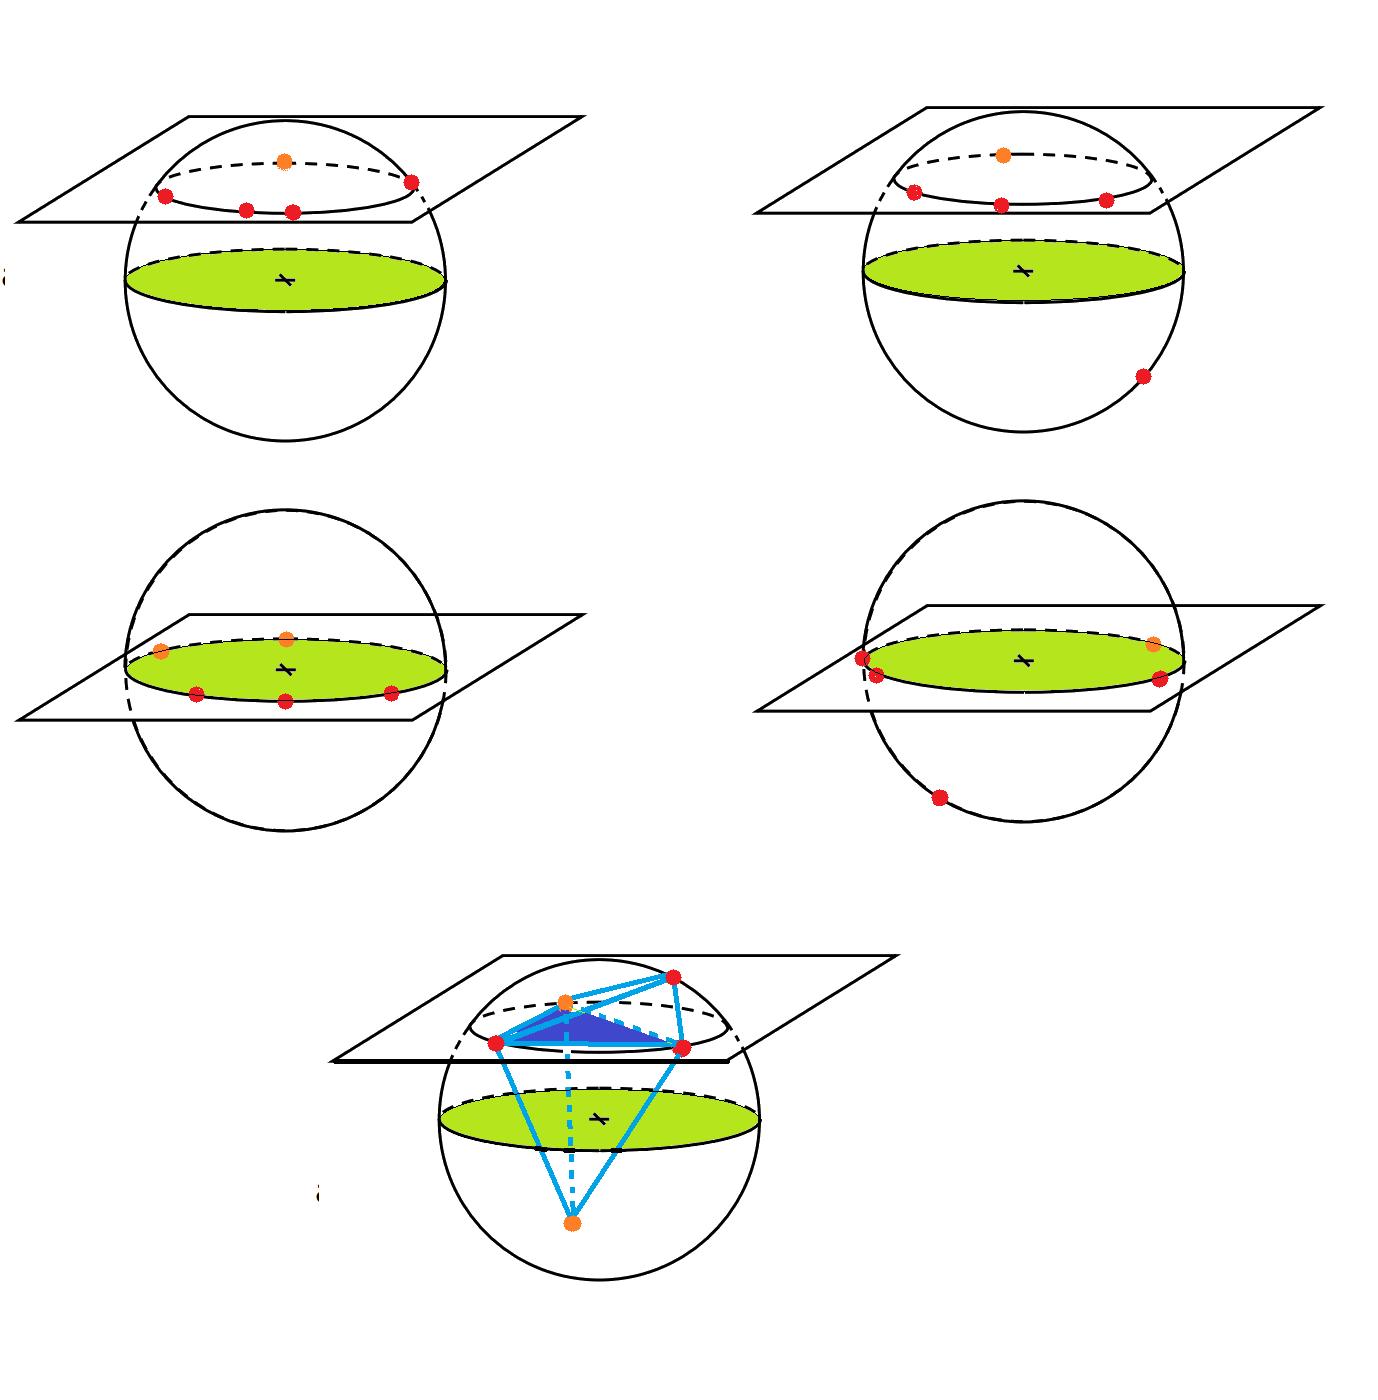 http://www.prise2tete.fr/upload/gwen27-g72.png